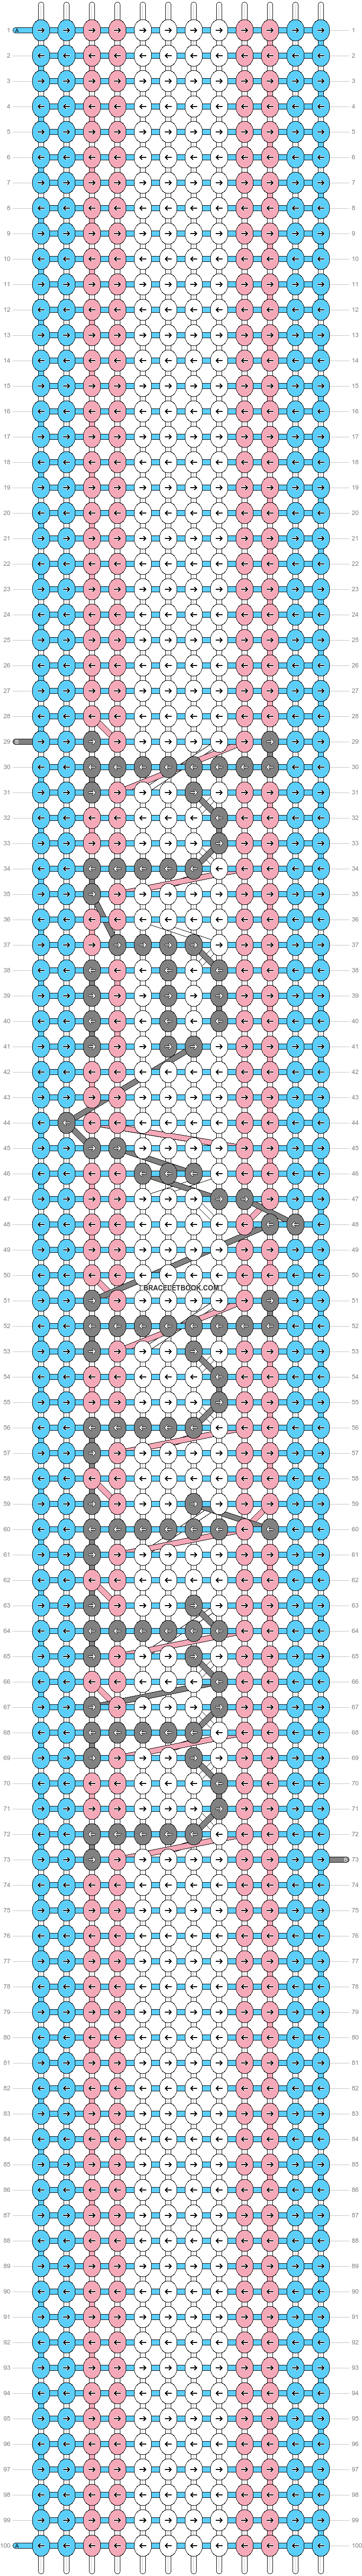 Alpha pattern #44322 pattern